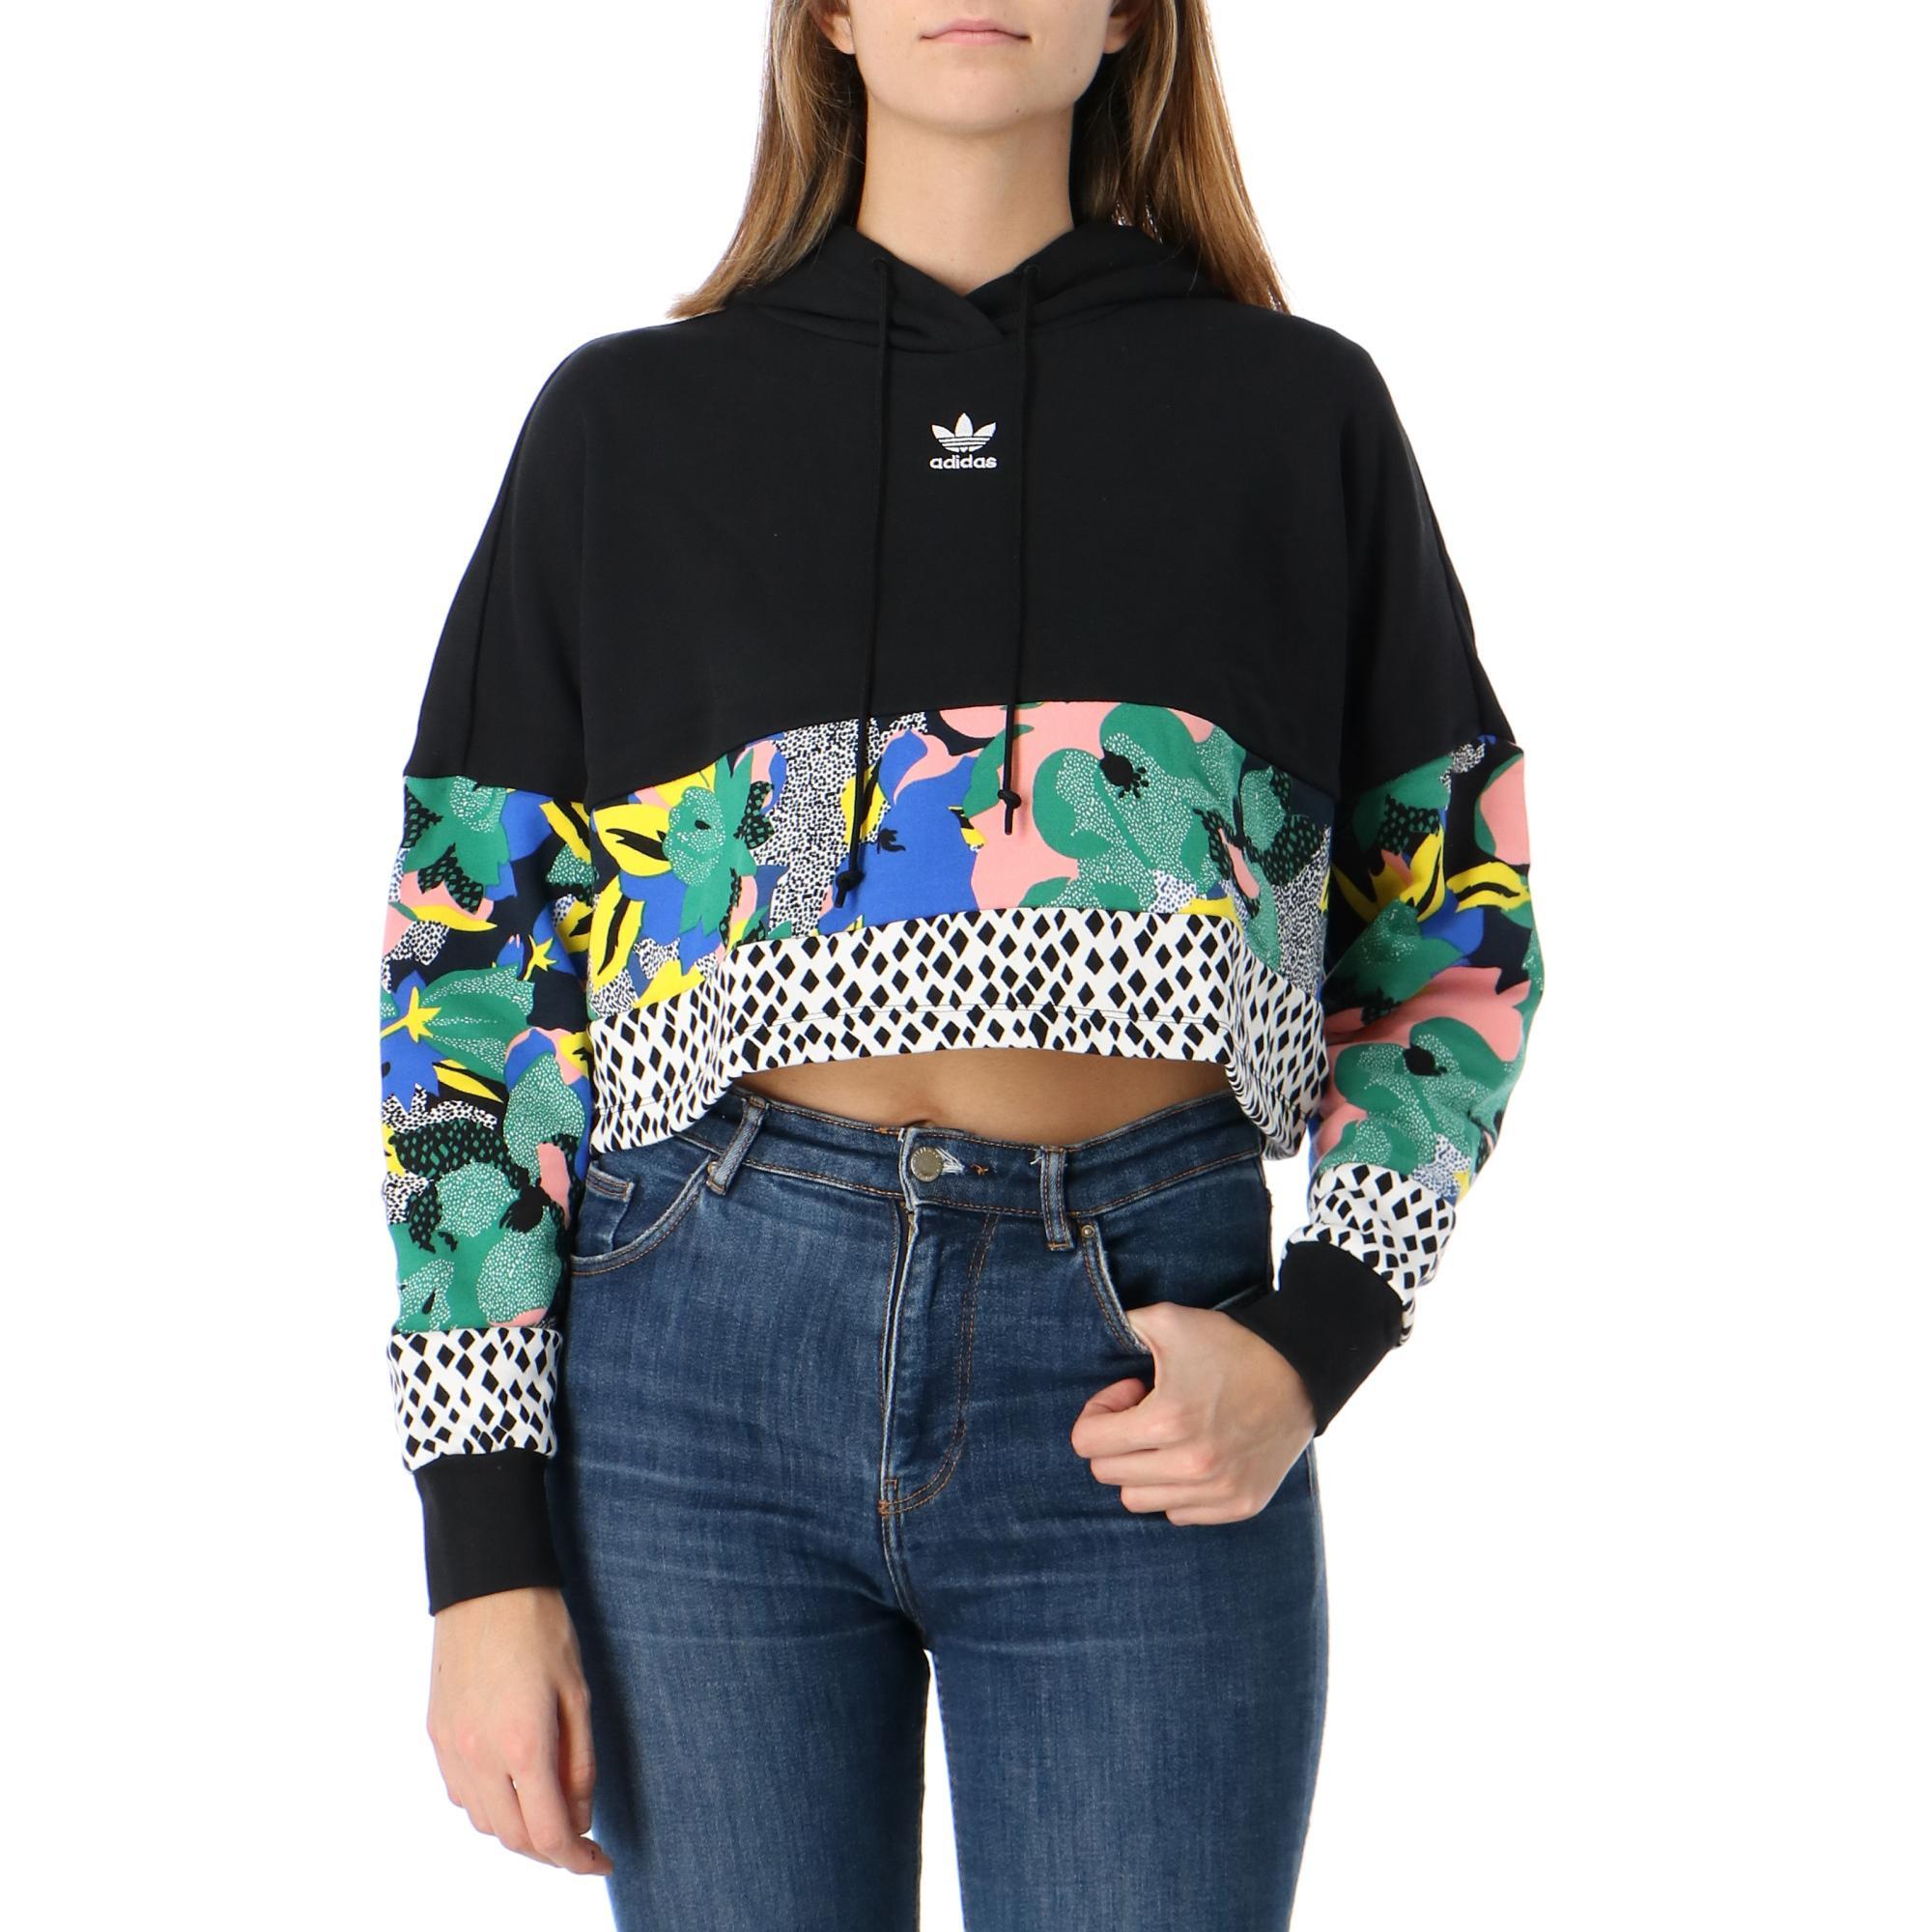 Adidas Cropped Hoodie Black multicolor